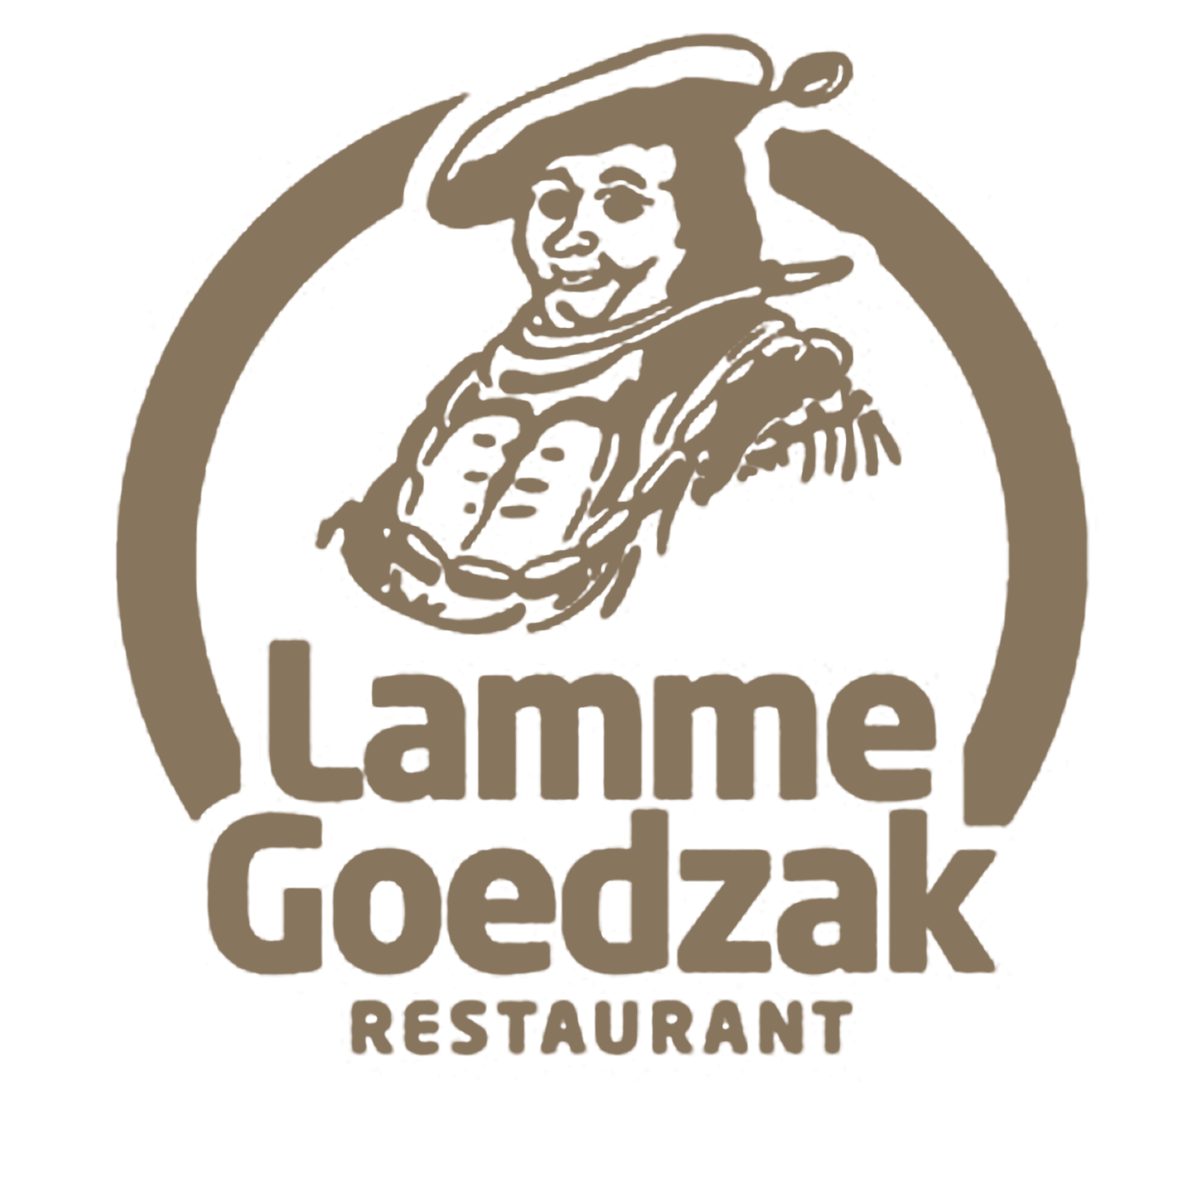 De Lamme Goedzak